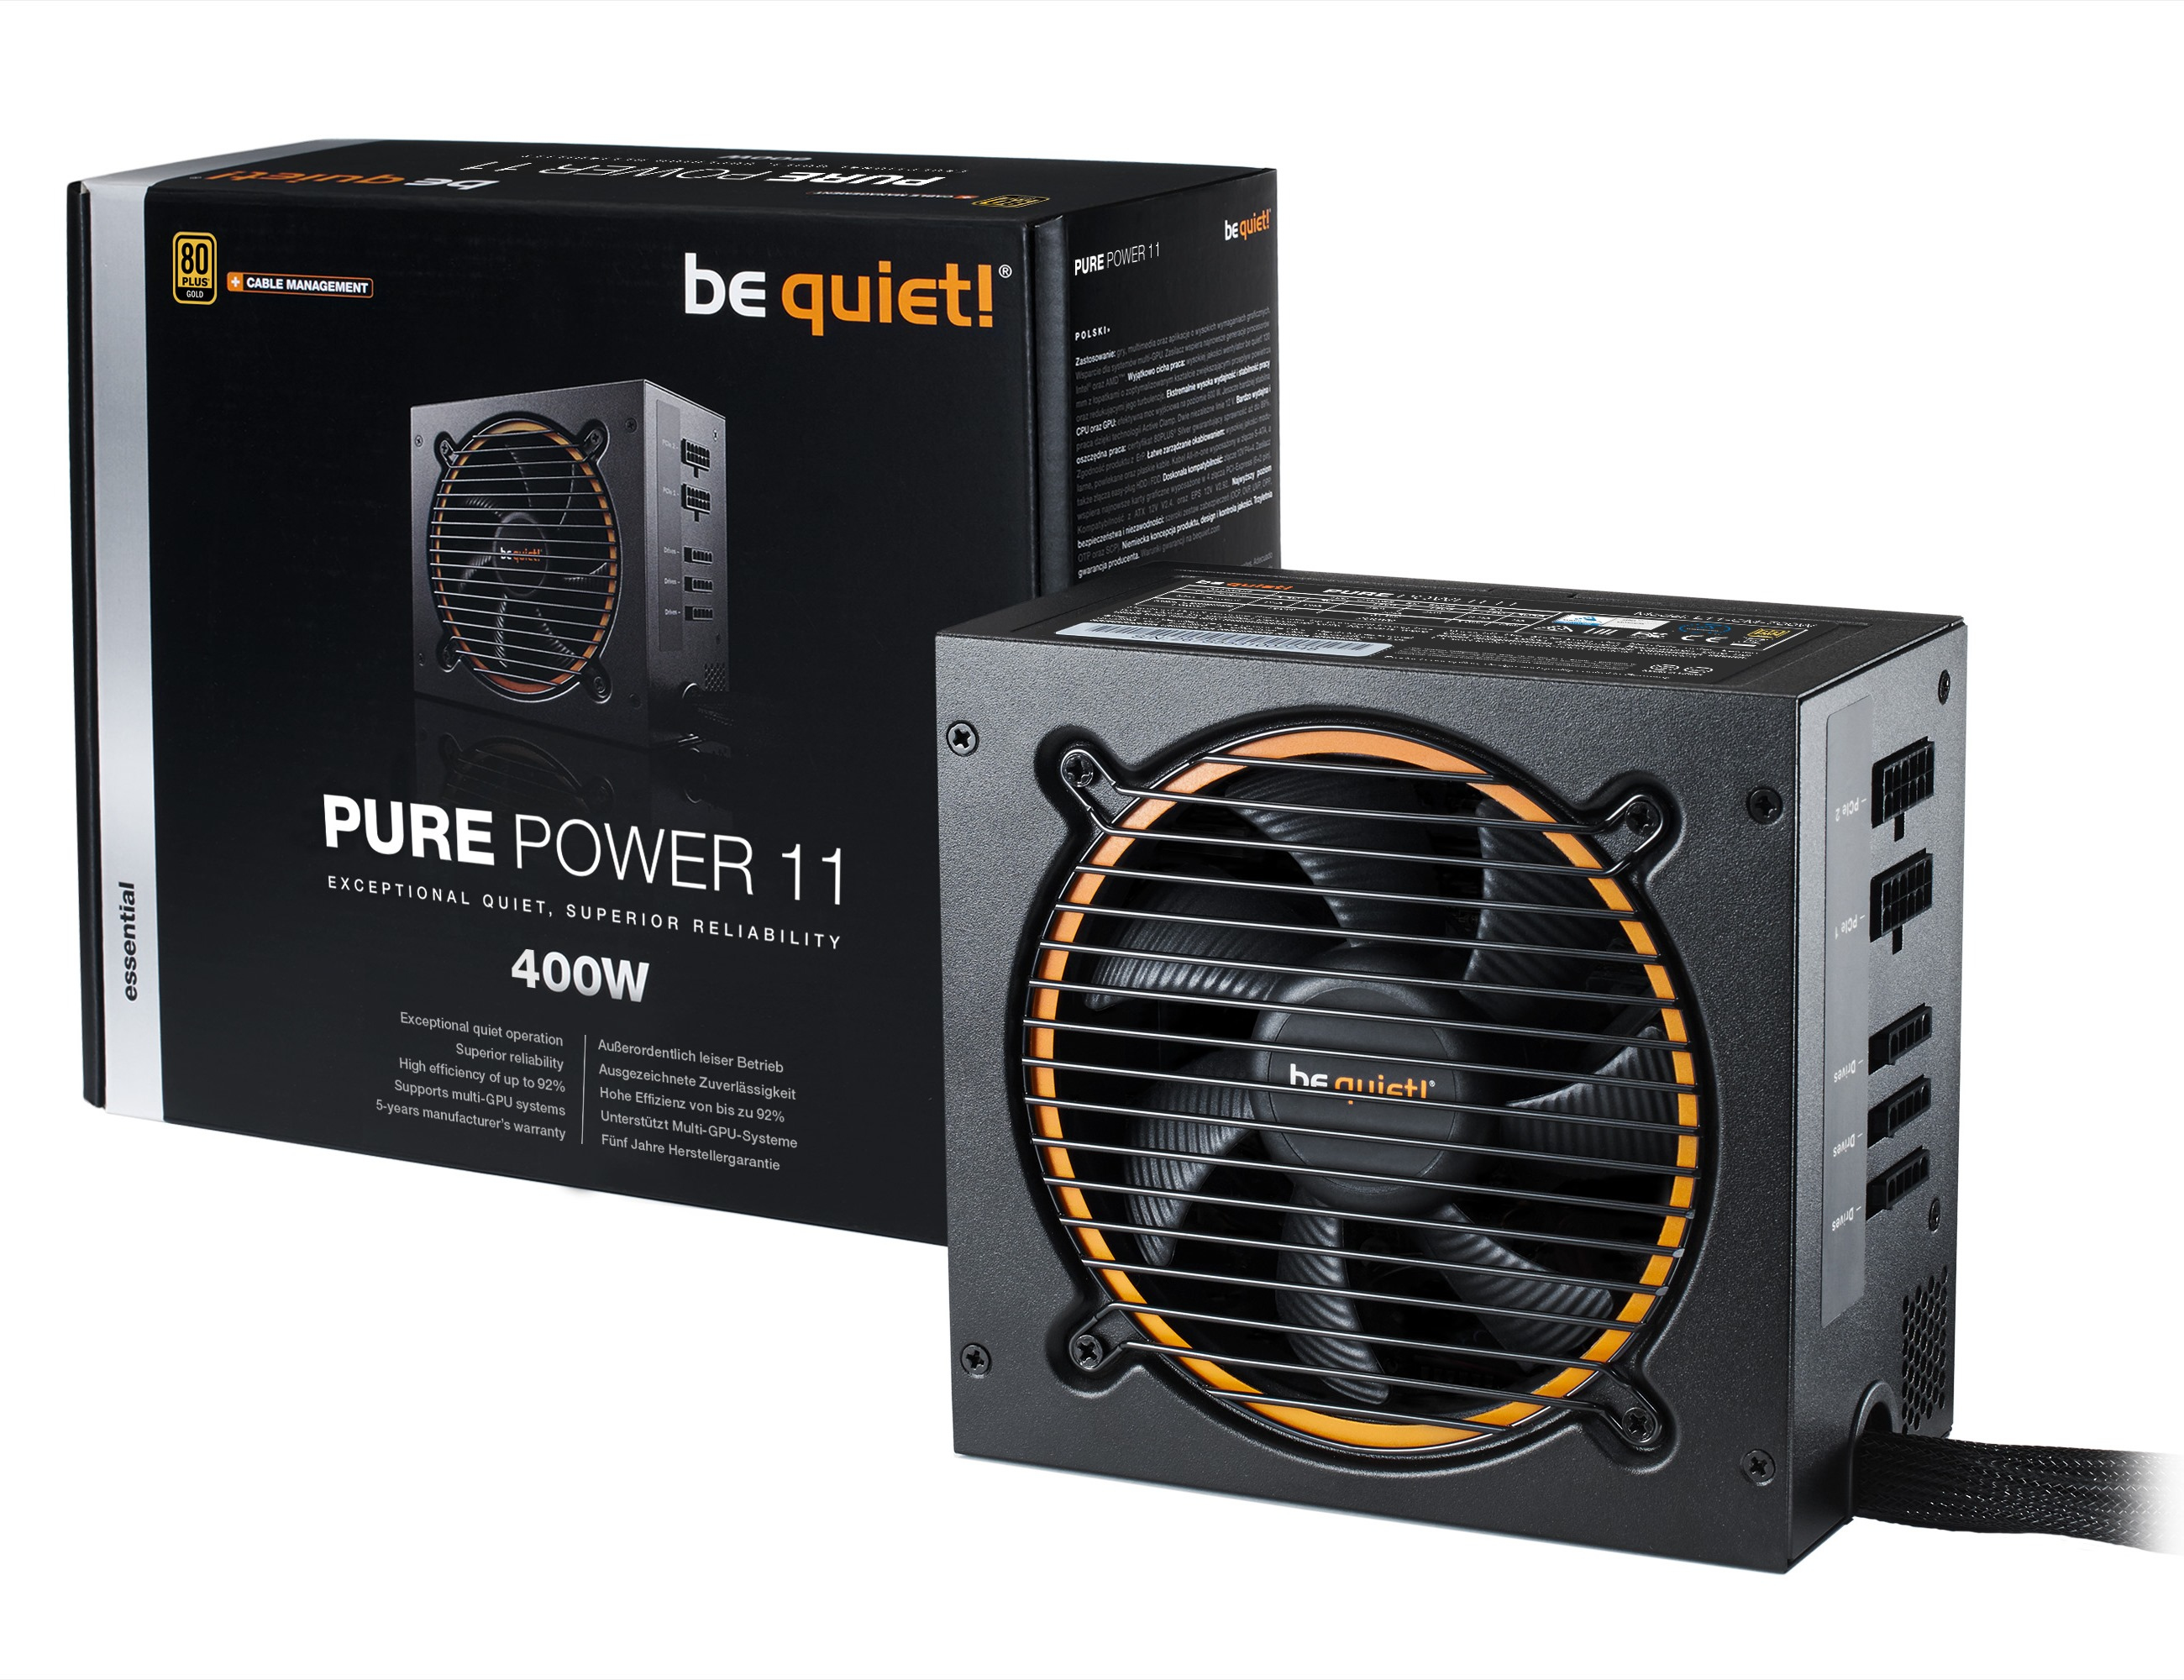 be quiet! Pure Power 11 400W CM, Cable Management, 80+ Gold, ErP, Energy Star 6.0 APFC, Sleeved, 2xPCI-Ex, 5xSATA, 2xPATA, 2 Rails, 120 mm Fan